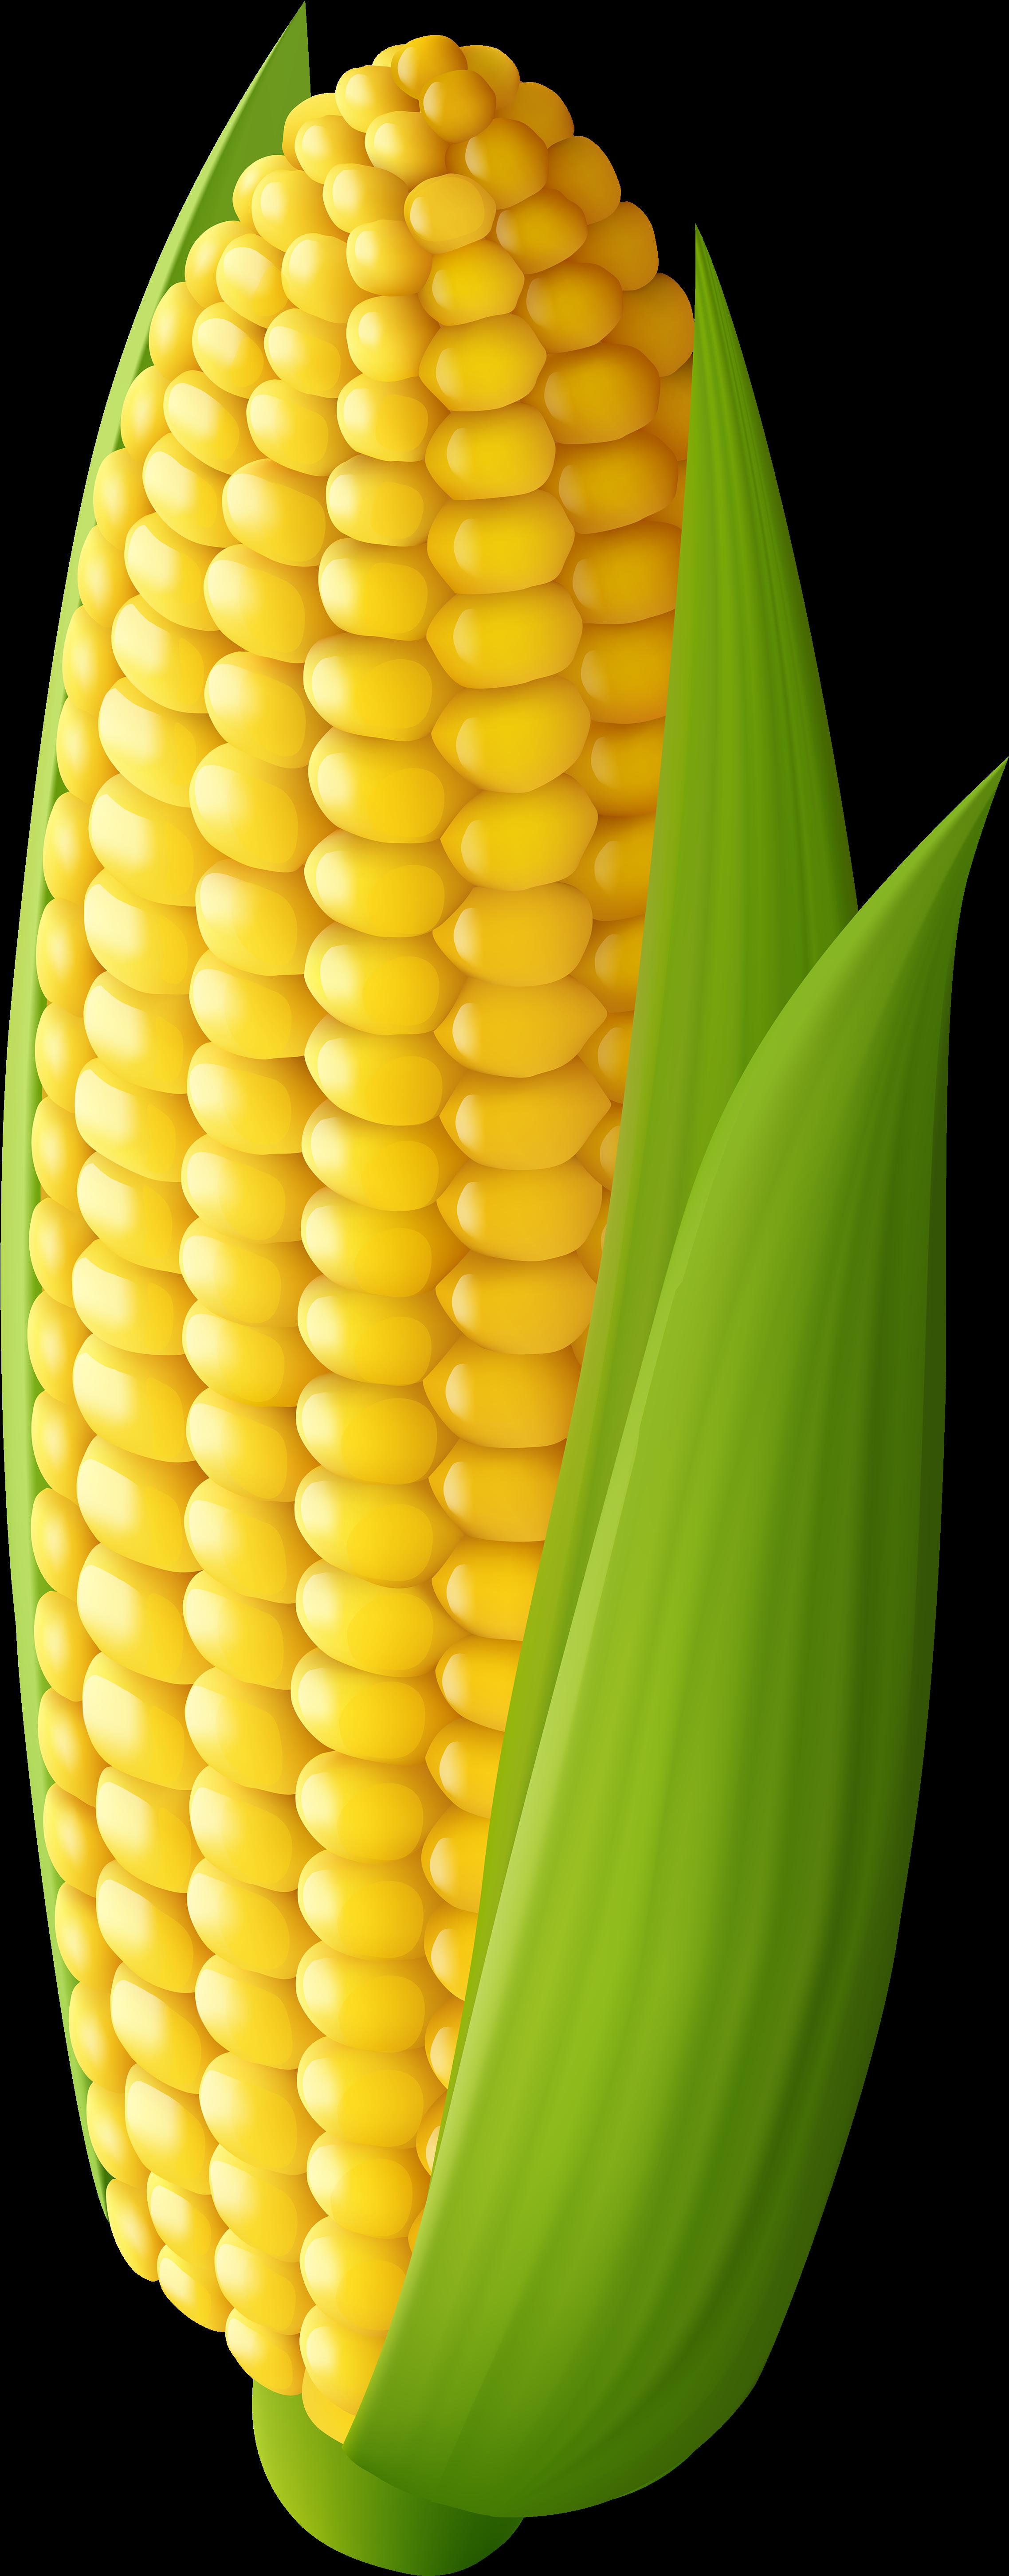 Free Corn Transparent, Download Free Clip Art, Free Clip Art.